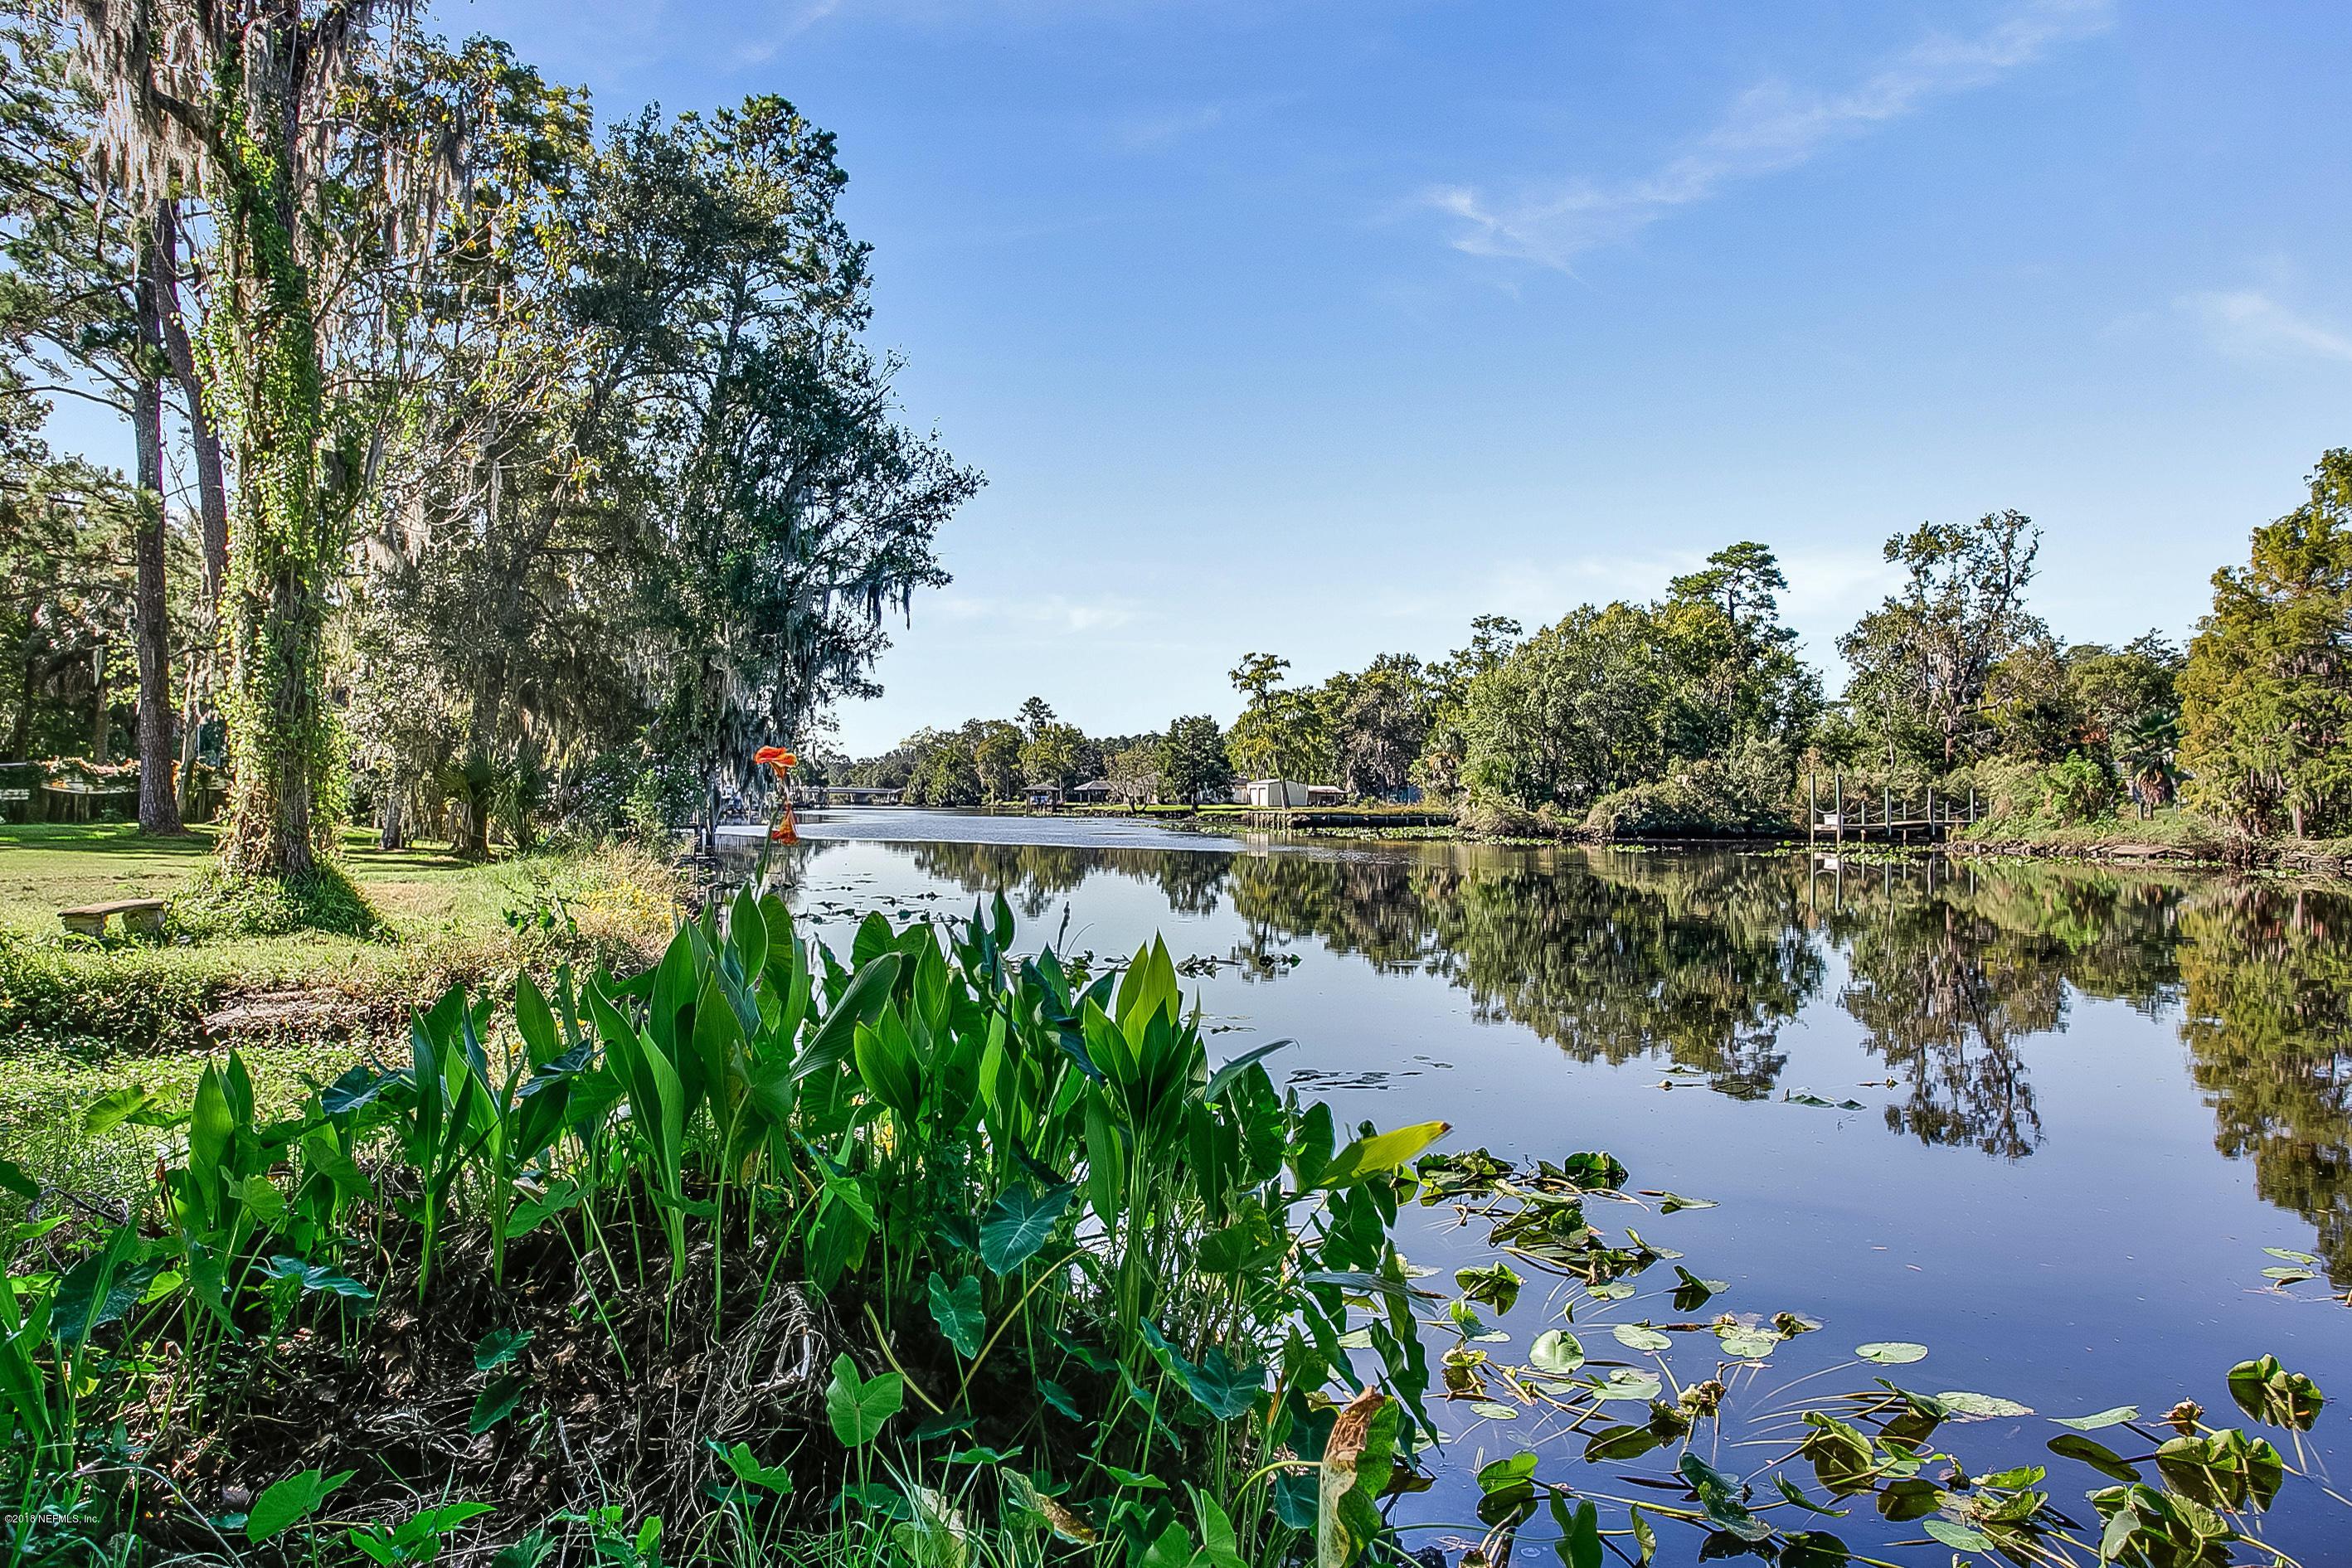 1746 LAKE SHORE, JACKSONVILLE, FLORIDA 32210, 3 Bedrooms Bedrooms, ,2 BathroomsBathrooms,Residential - single family,For sale,LAKE SHORE,965778